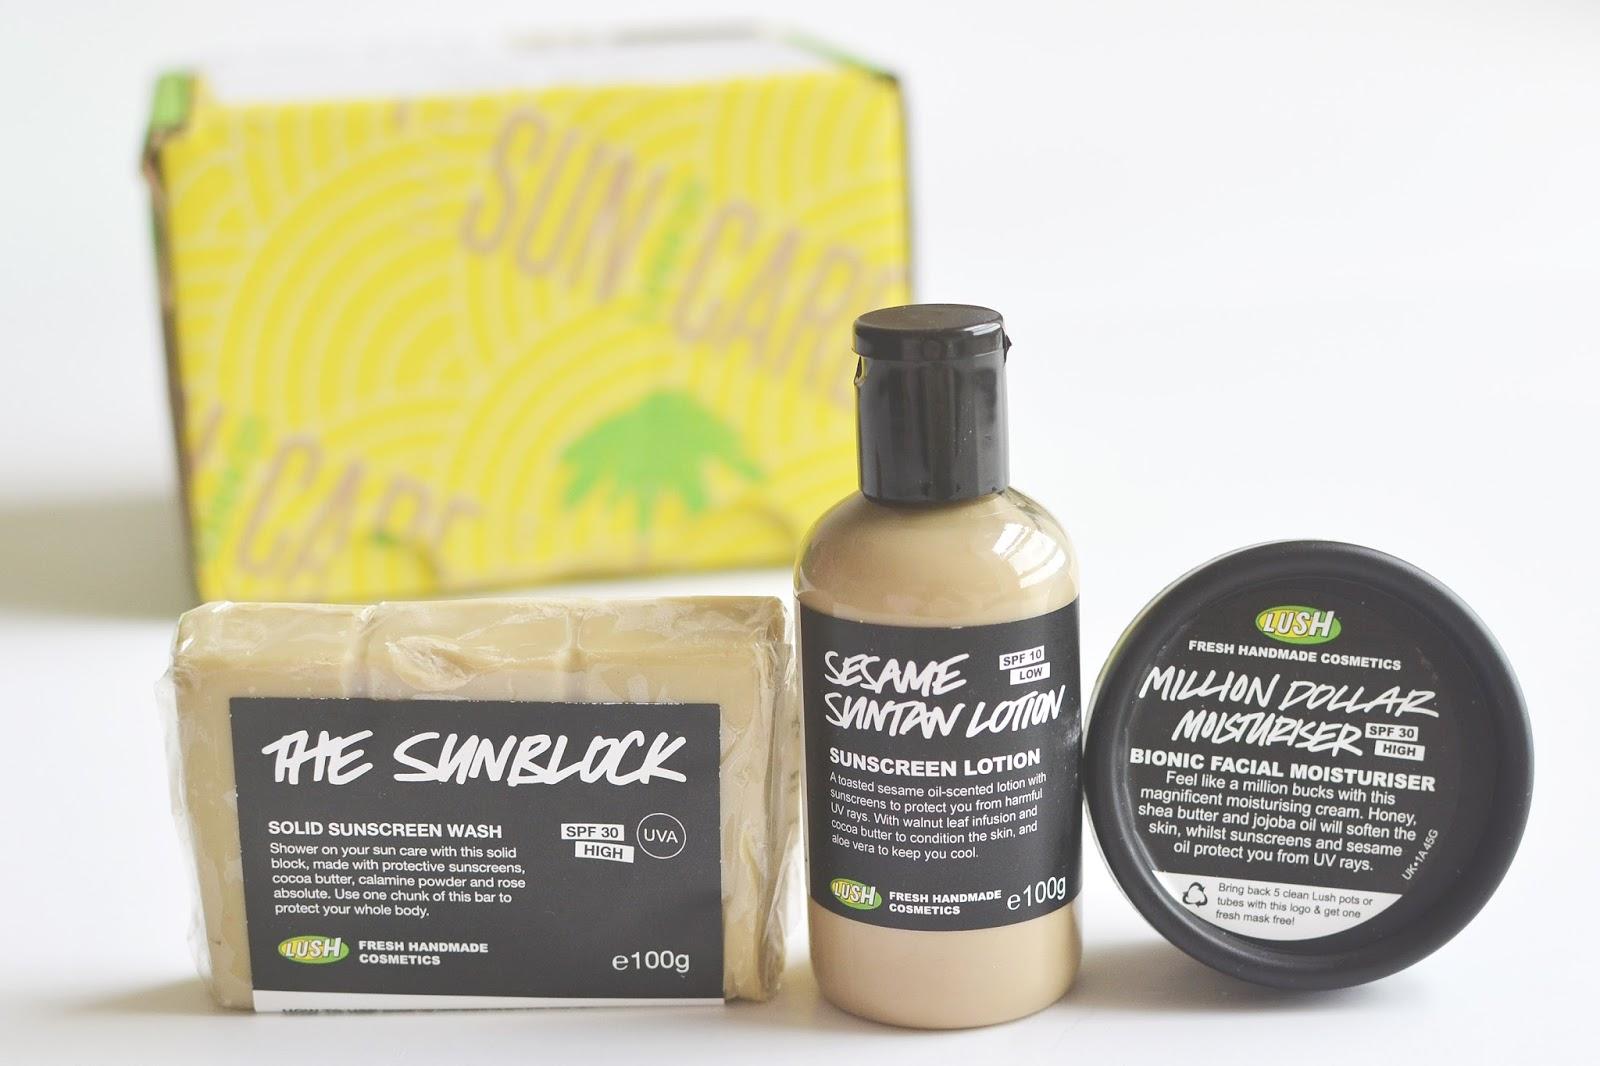 lush cosmetics sun care product, lush sunscreen